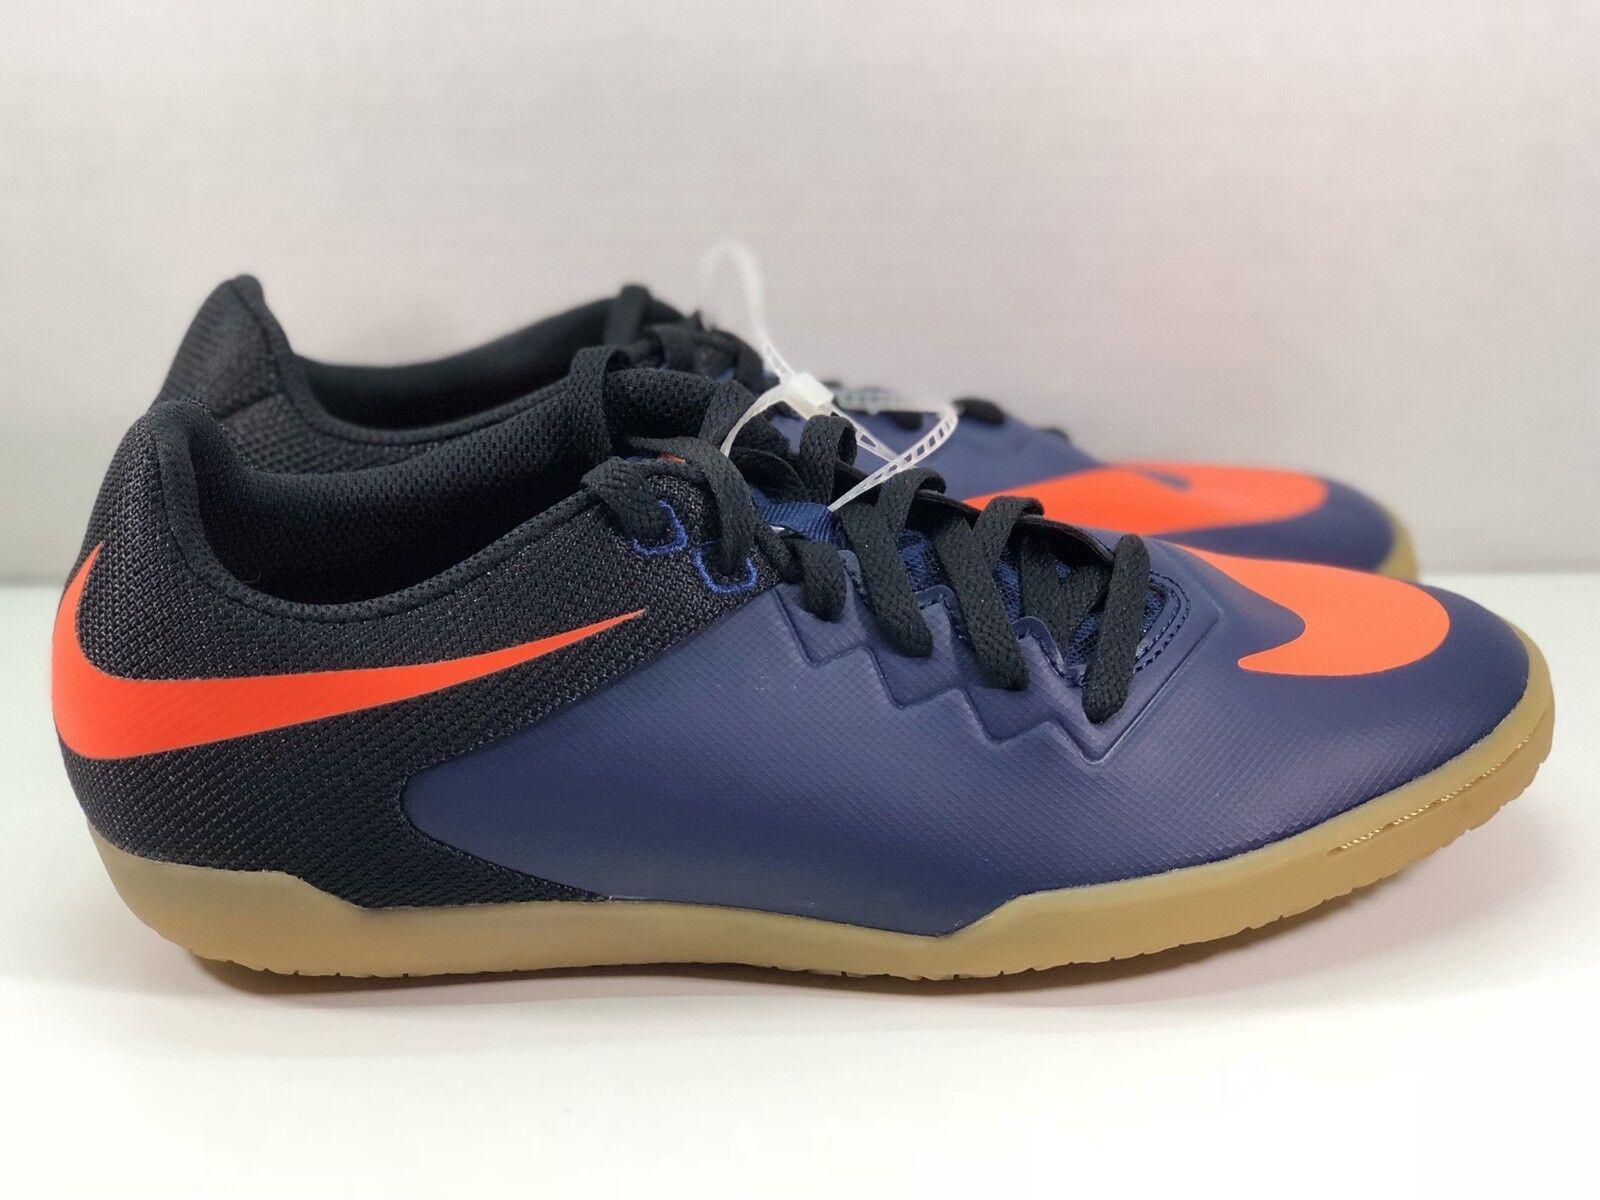 Nike hypervenomx pro m calcio maschile indoor scarpa da calcio m 749903 480 misura 8,5 2044ab